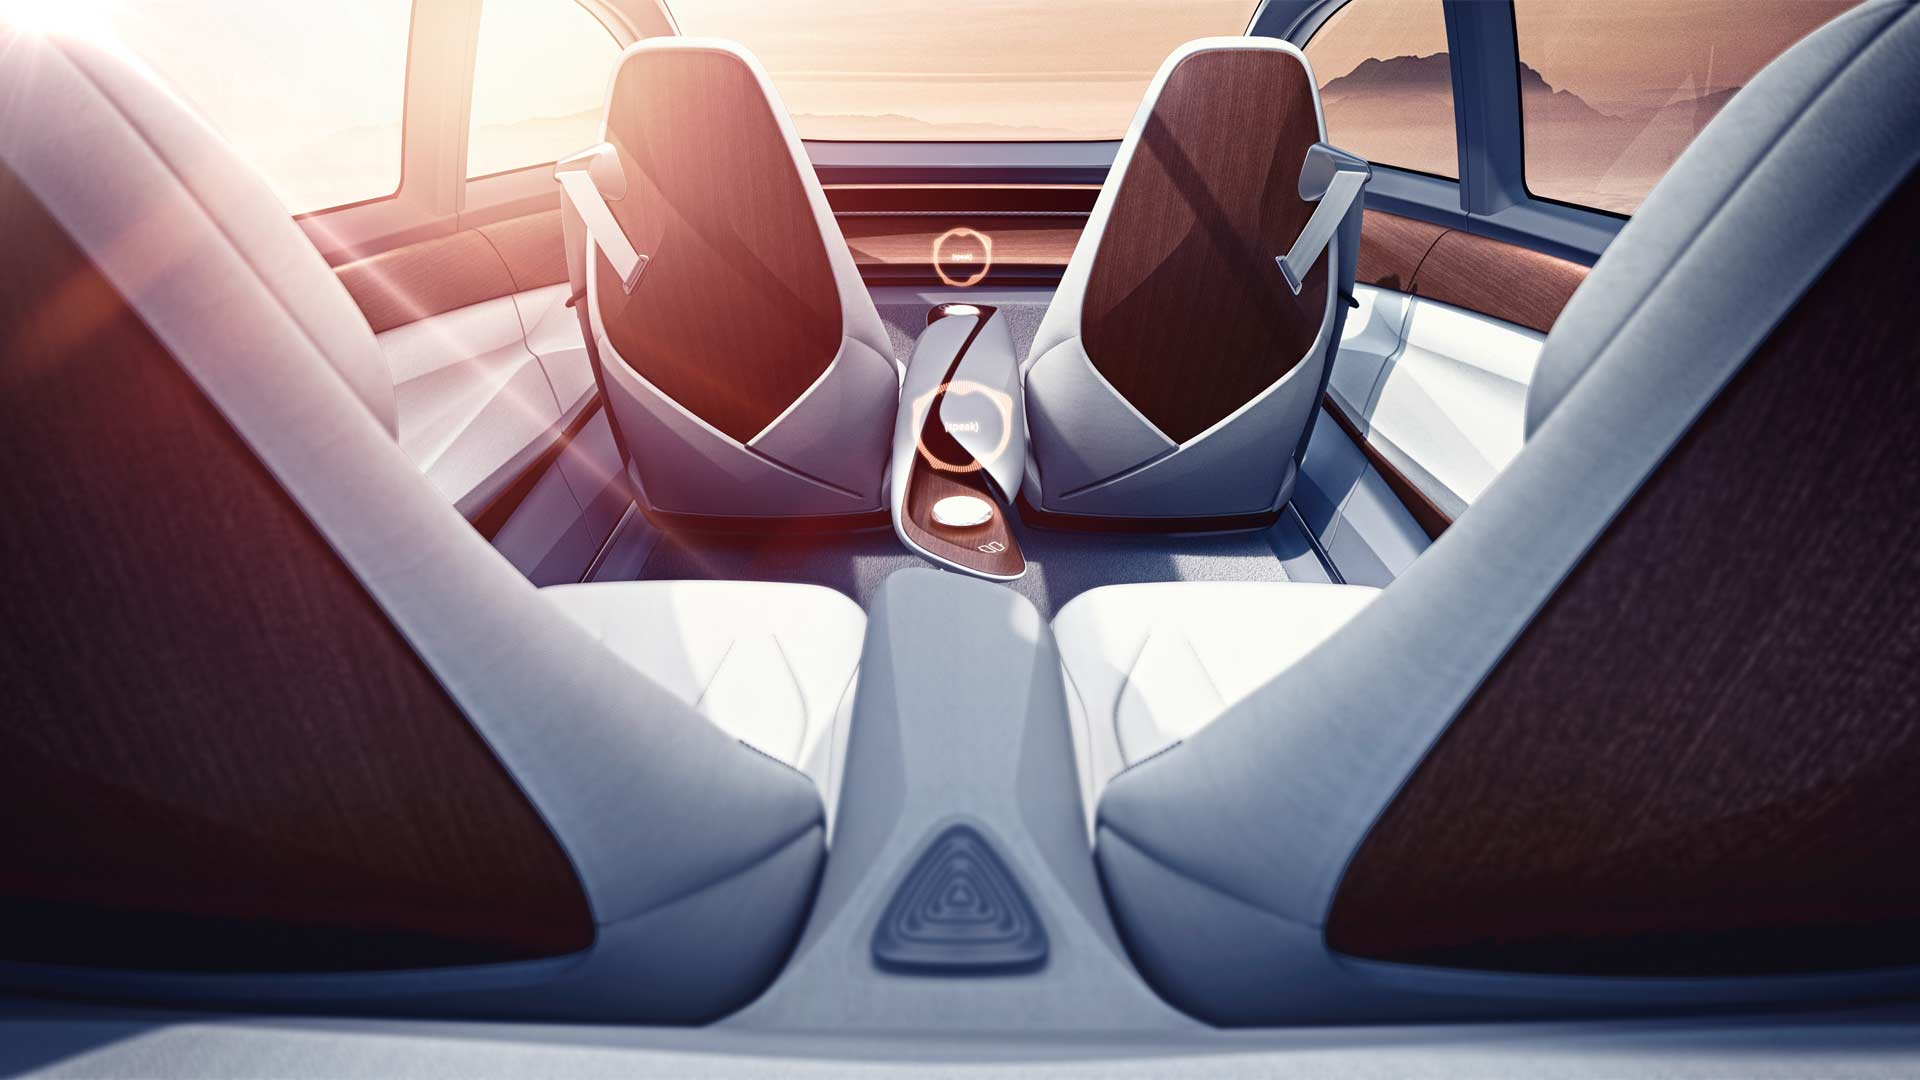 Volkswagen-I.D.-VIZZION-Concept-Interior_4